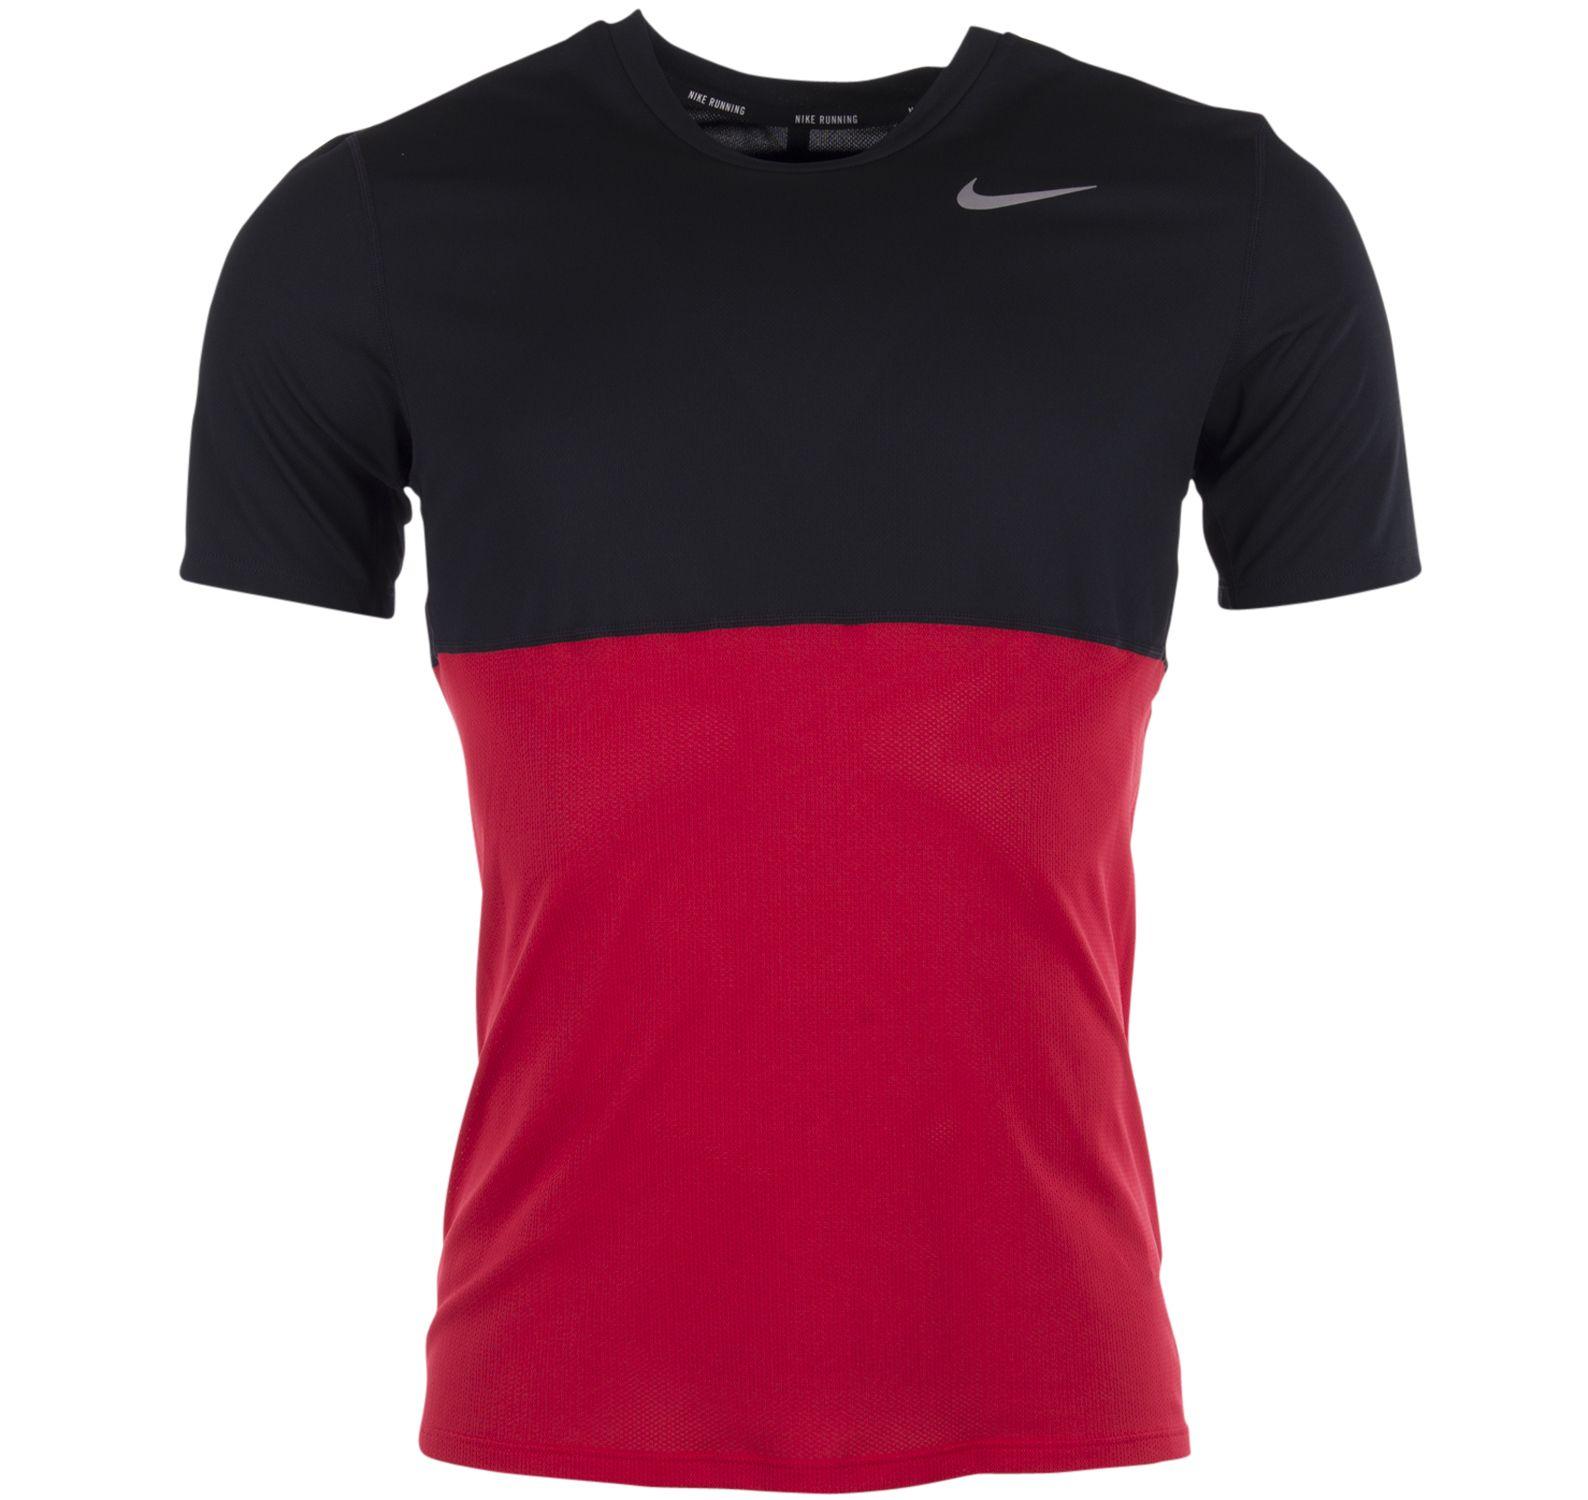 Racer Ss, University Red/Black/Reflectiv, S,  Nike